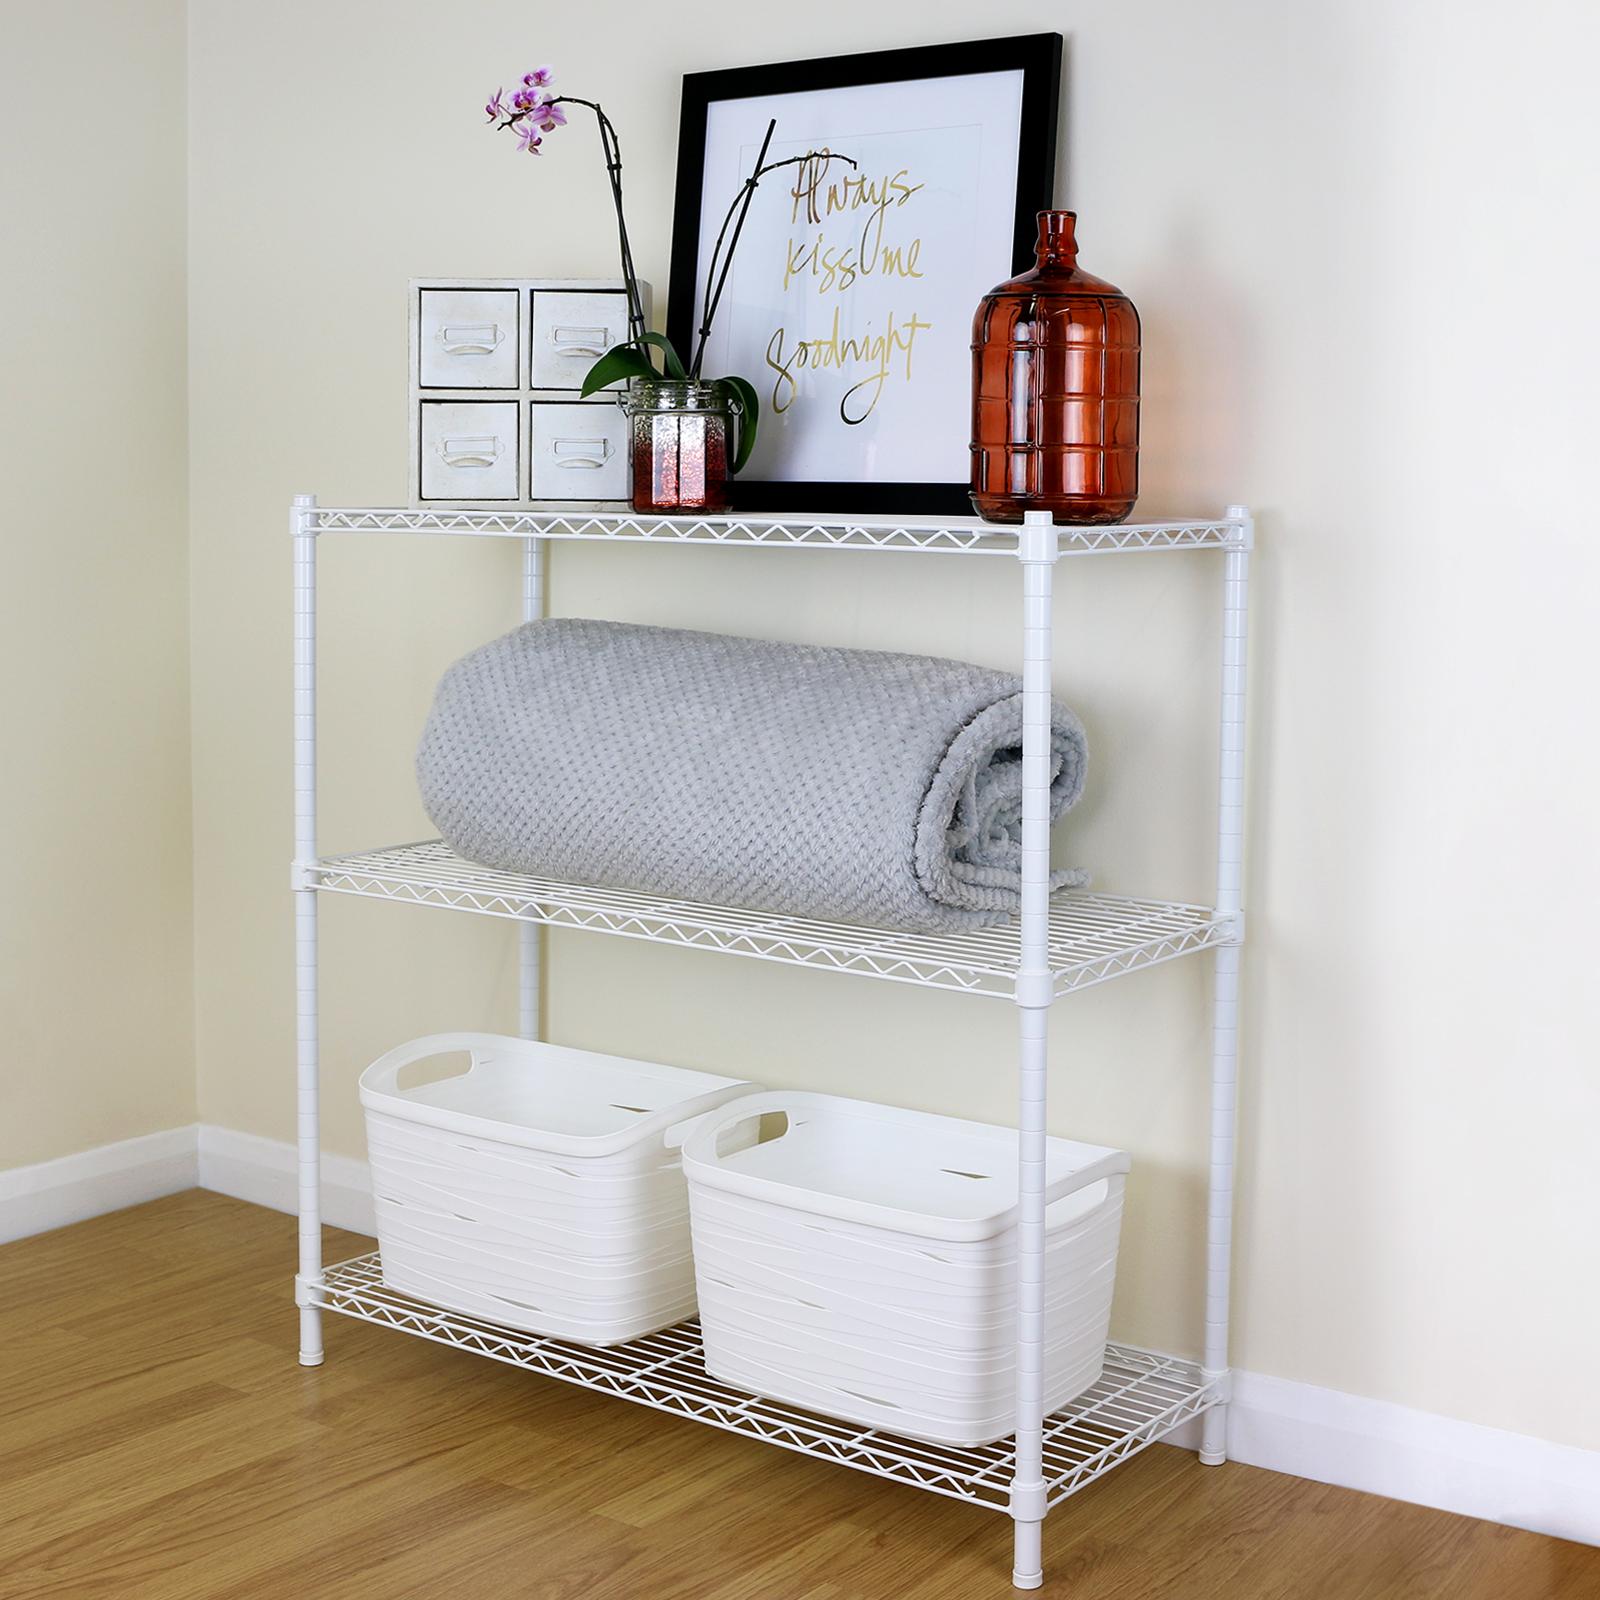 3 Tier White Metal Storage Rack/Shelving Wire Shelf Kitchen/Office ...